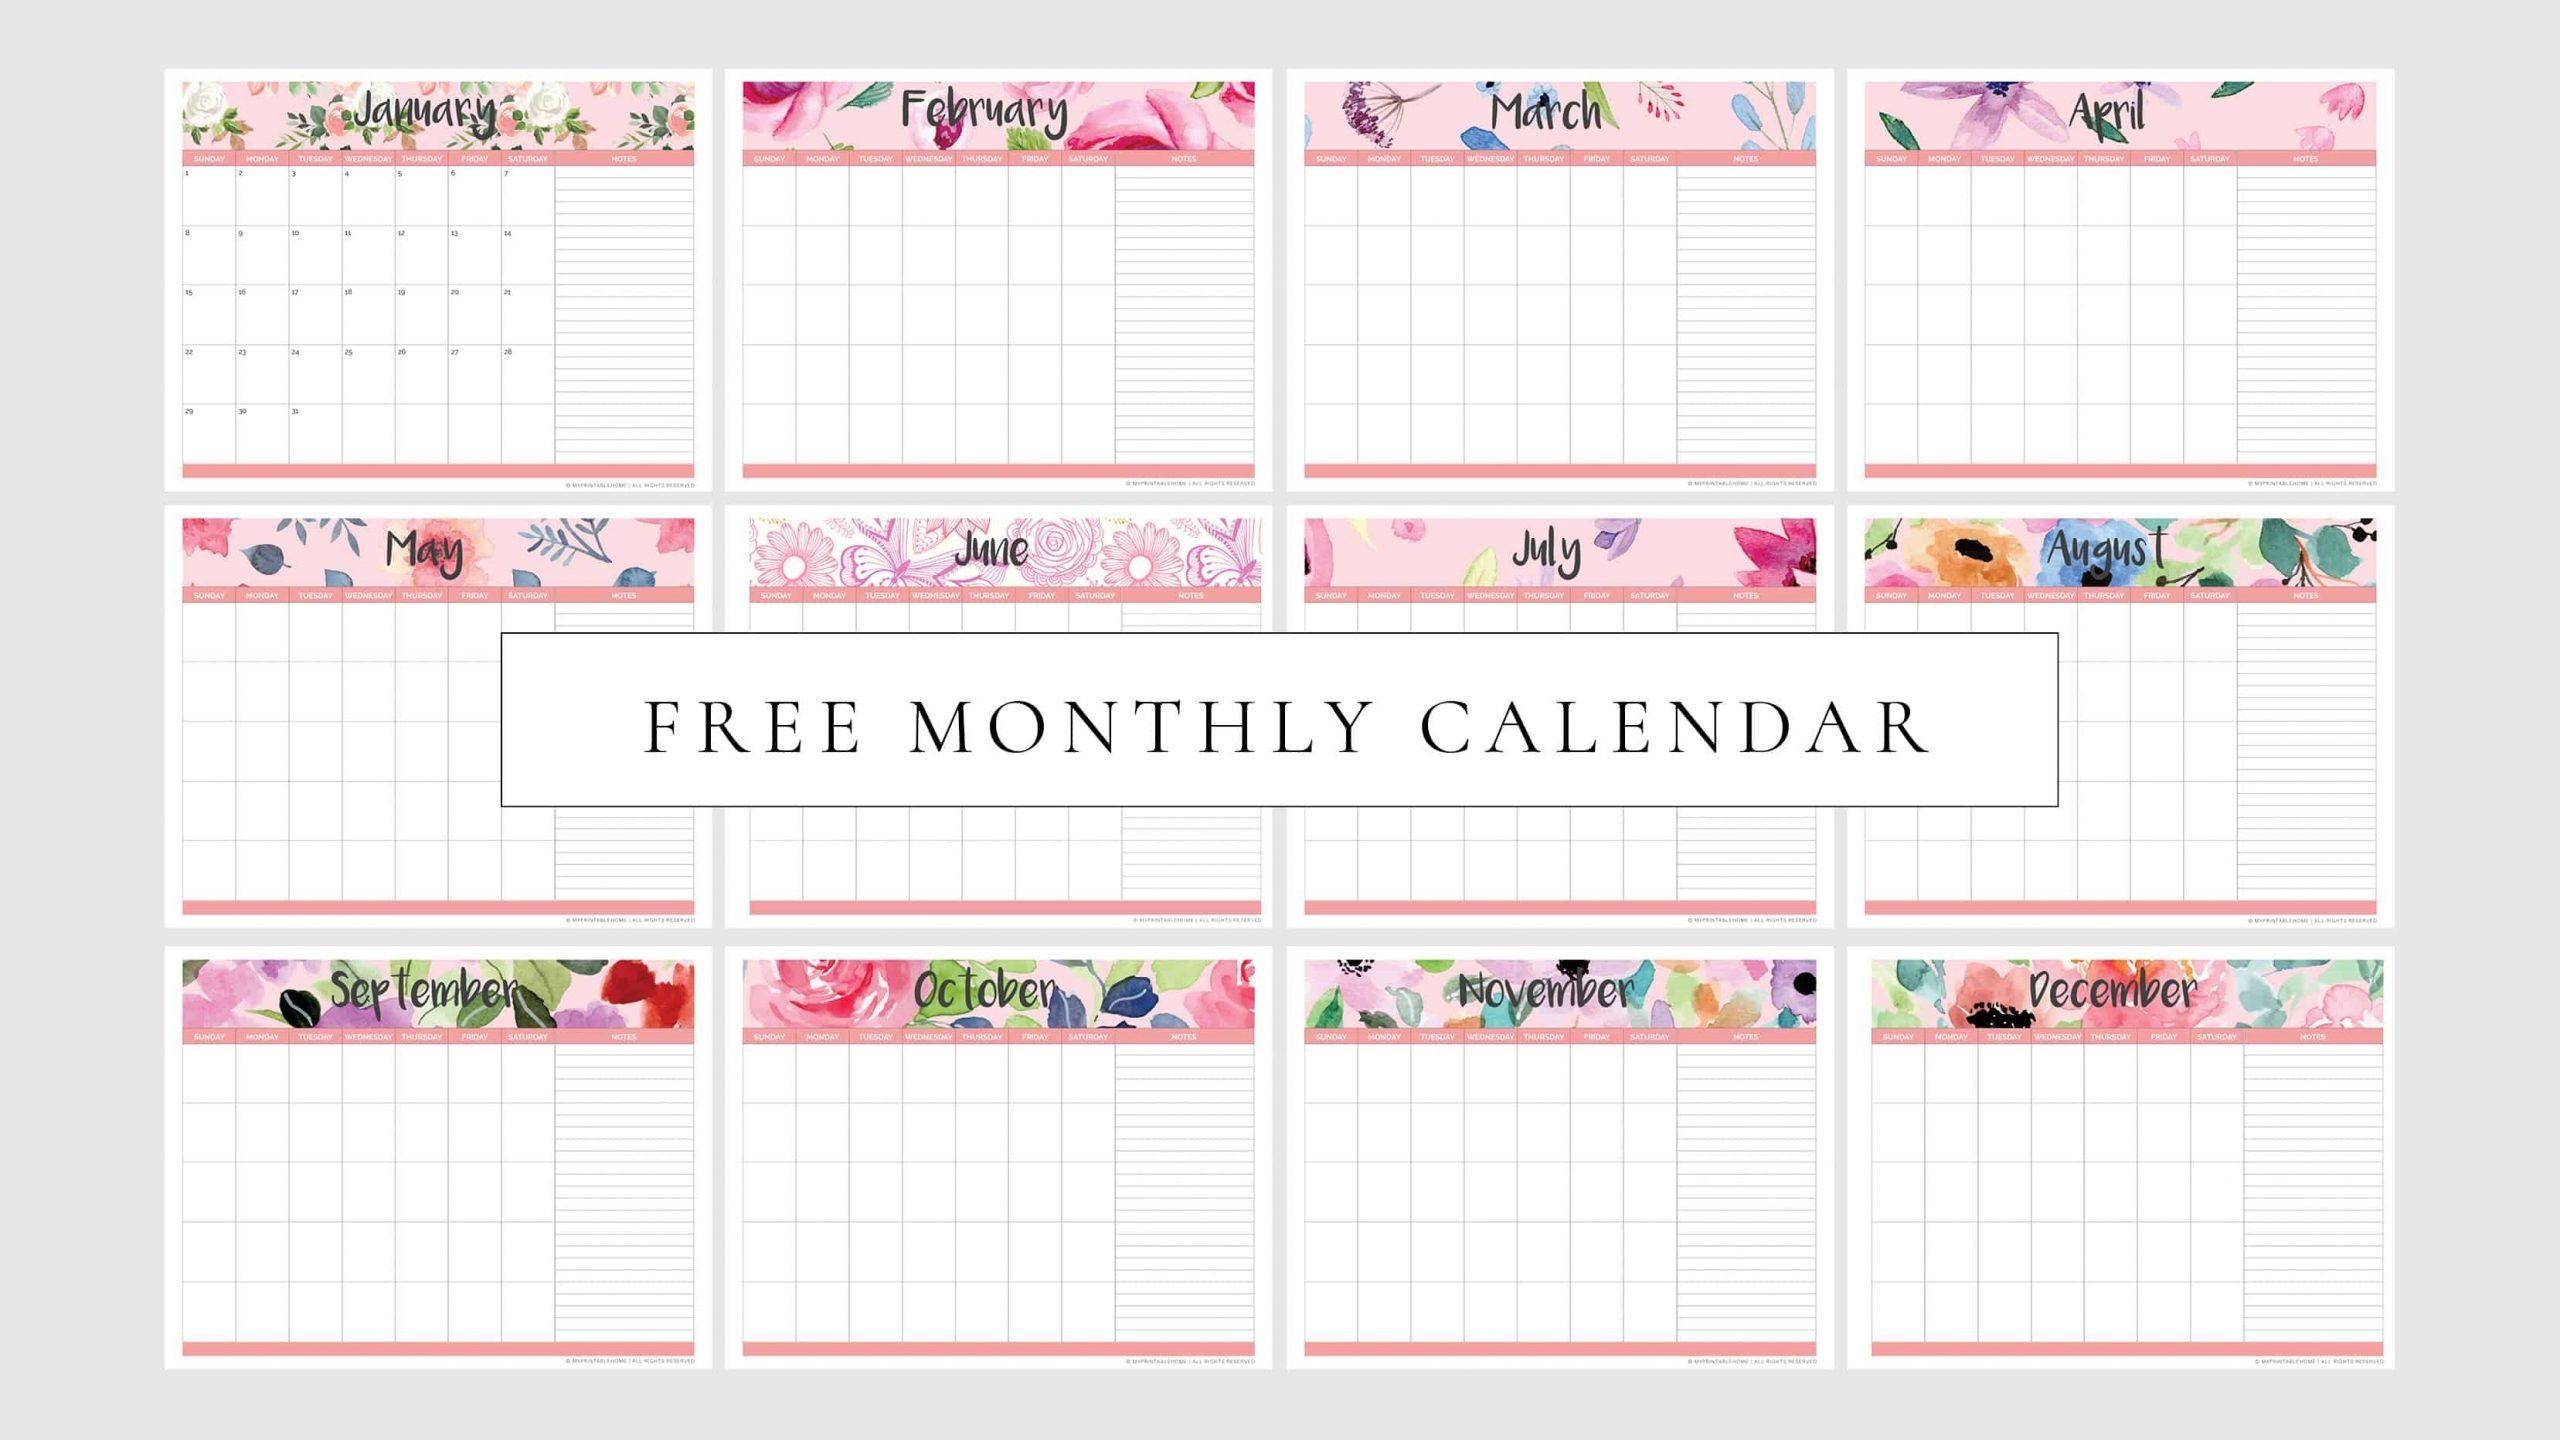 Free Printable Monthly Planner Calendar (Undated) - My